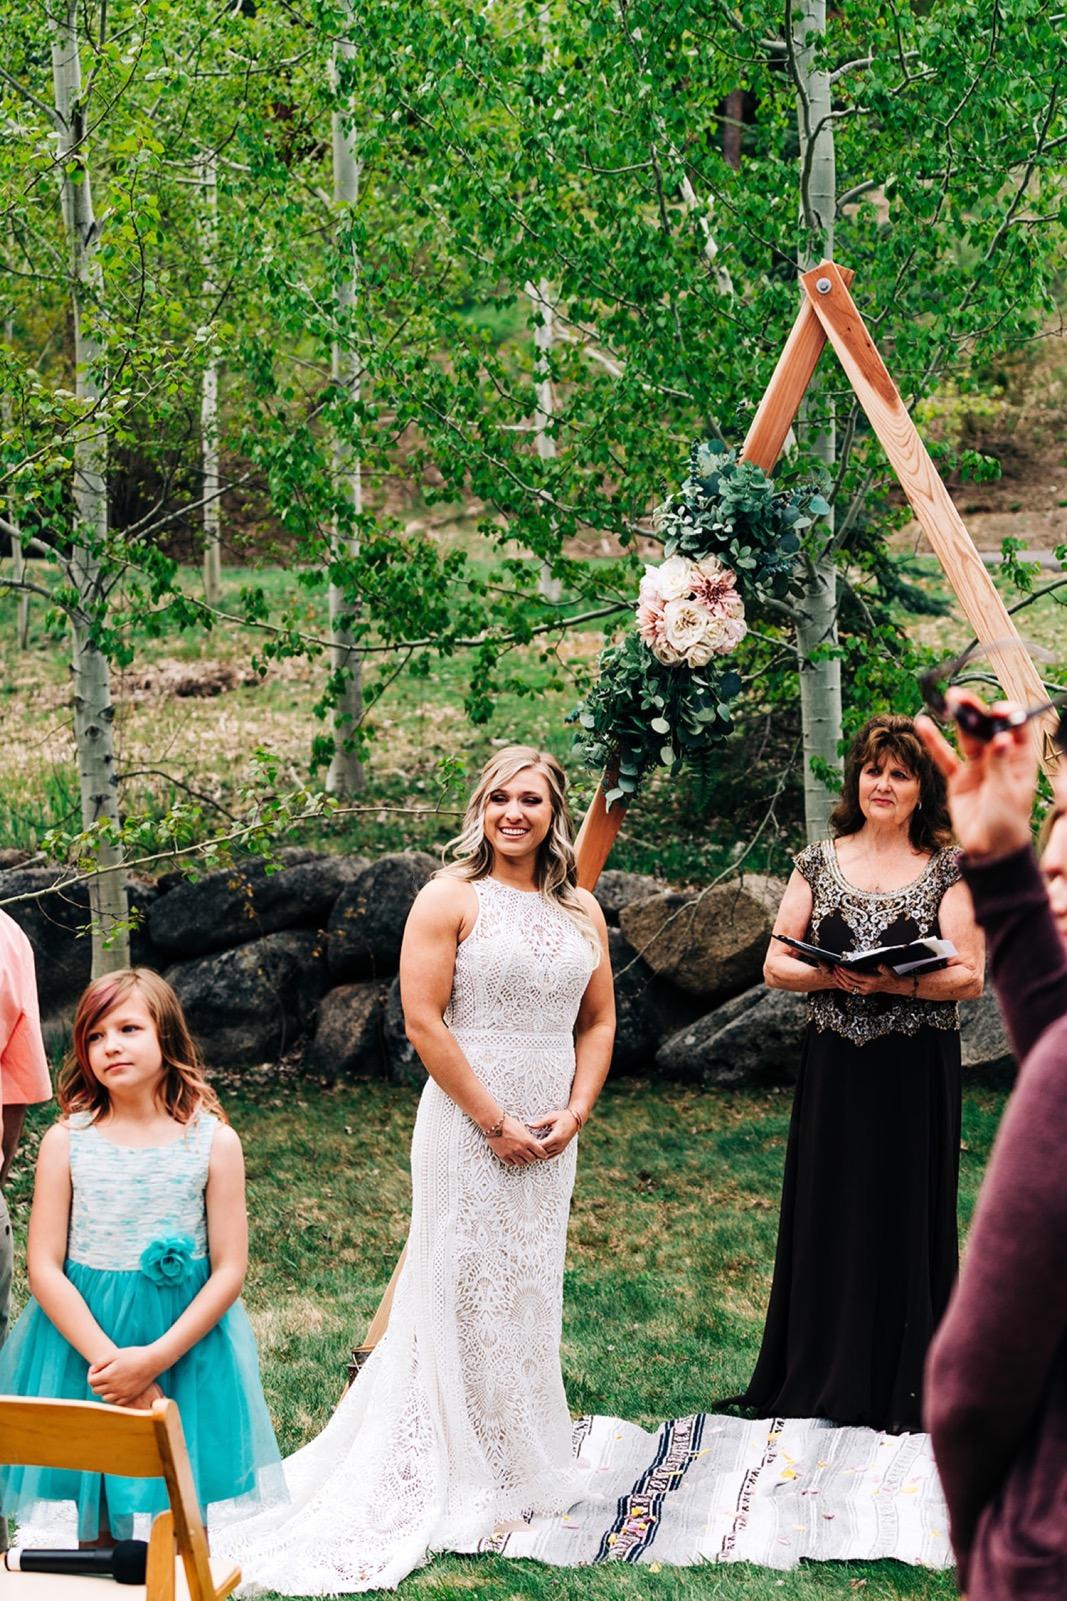 059_falissa_heather_wedding-146.jpg